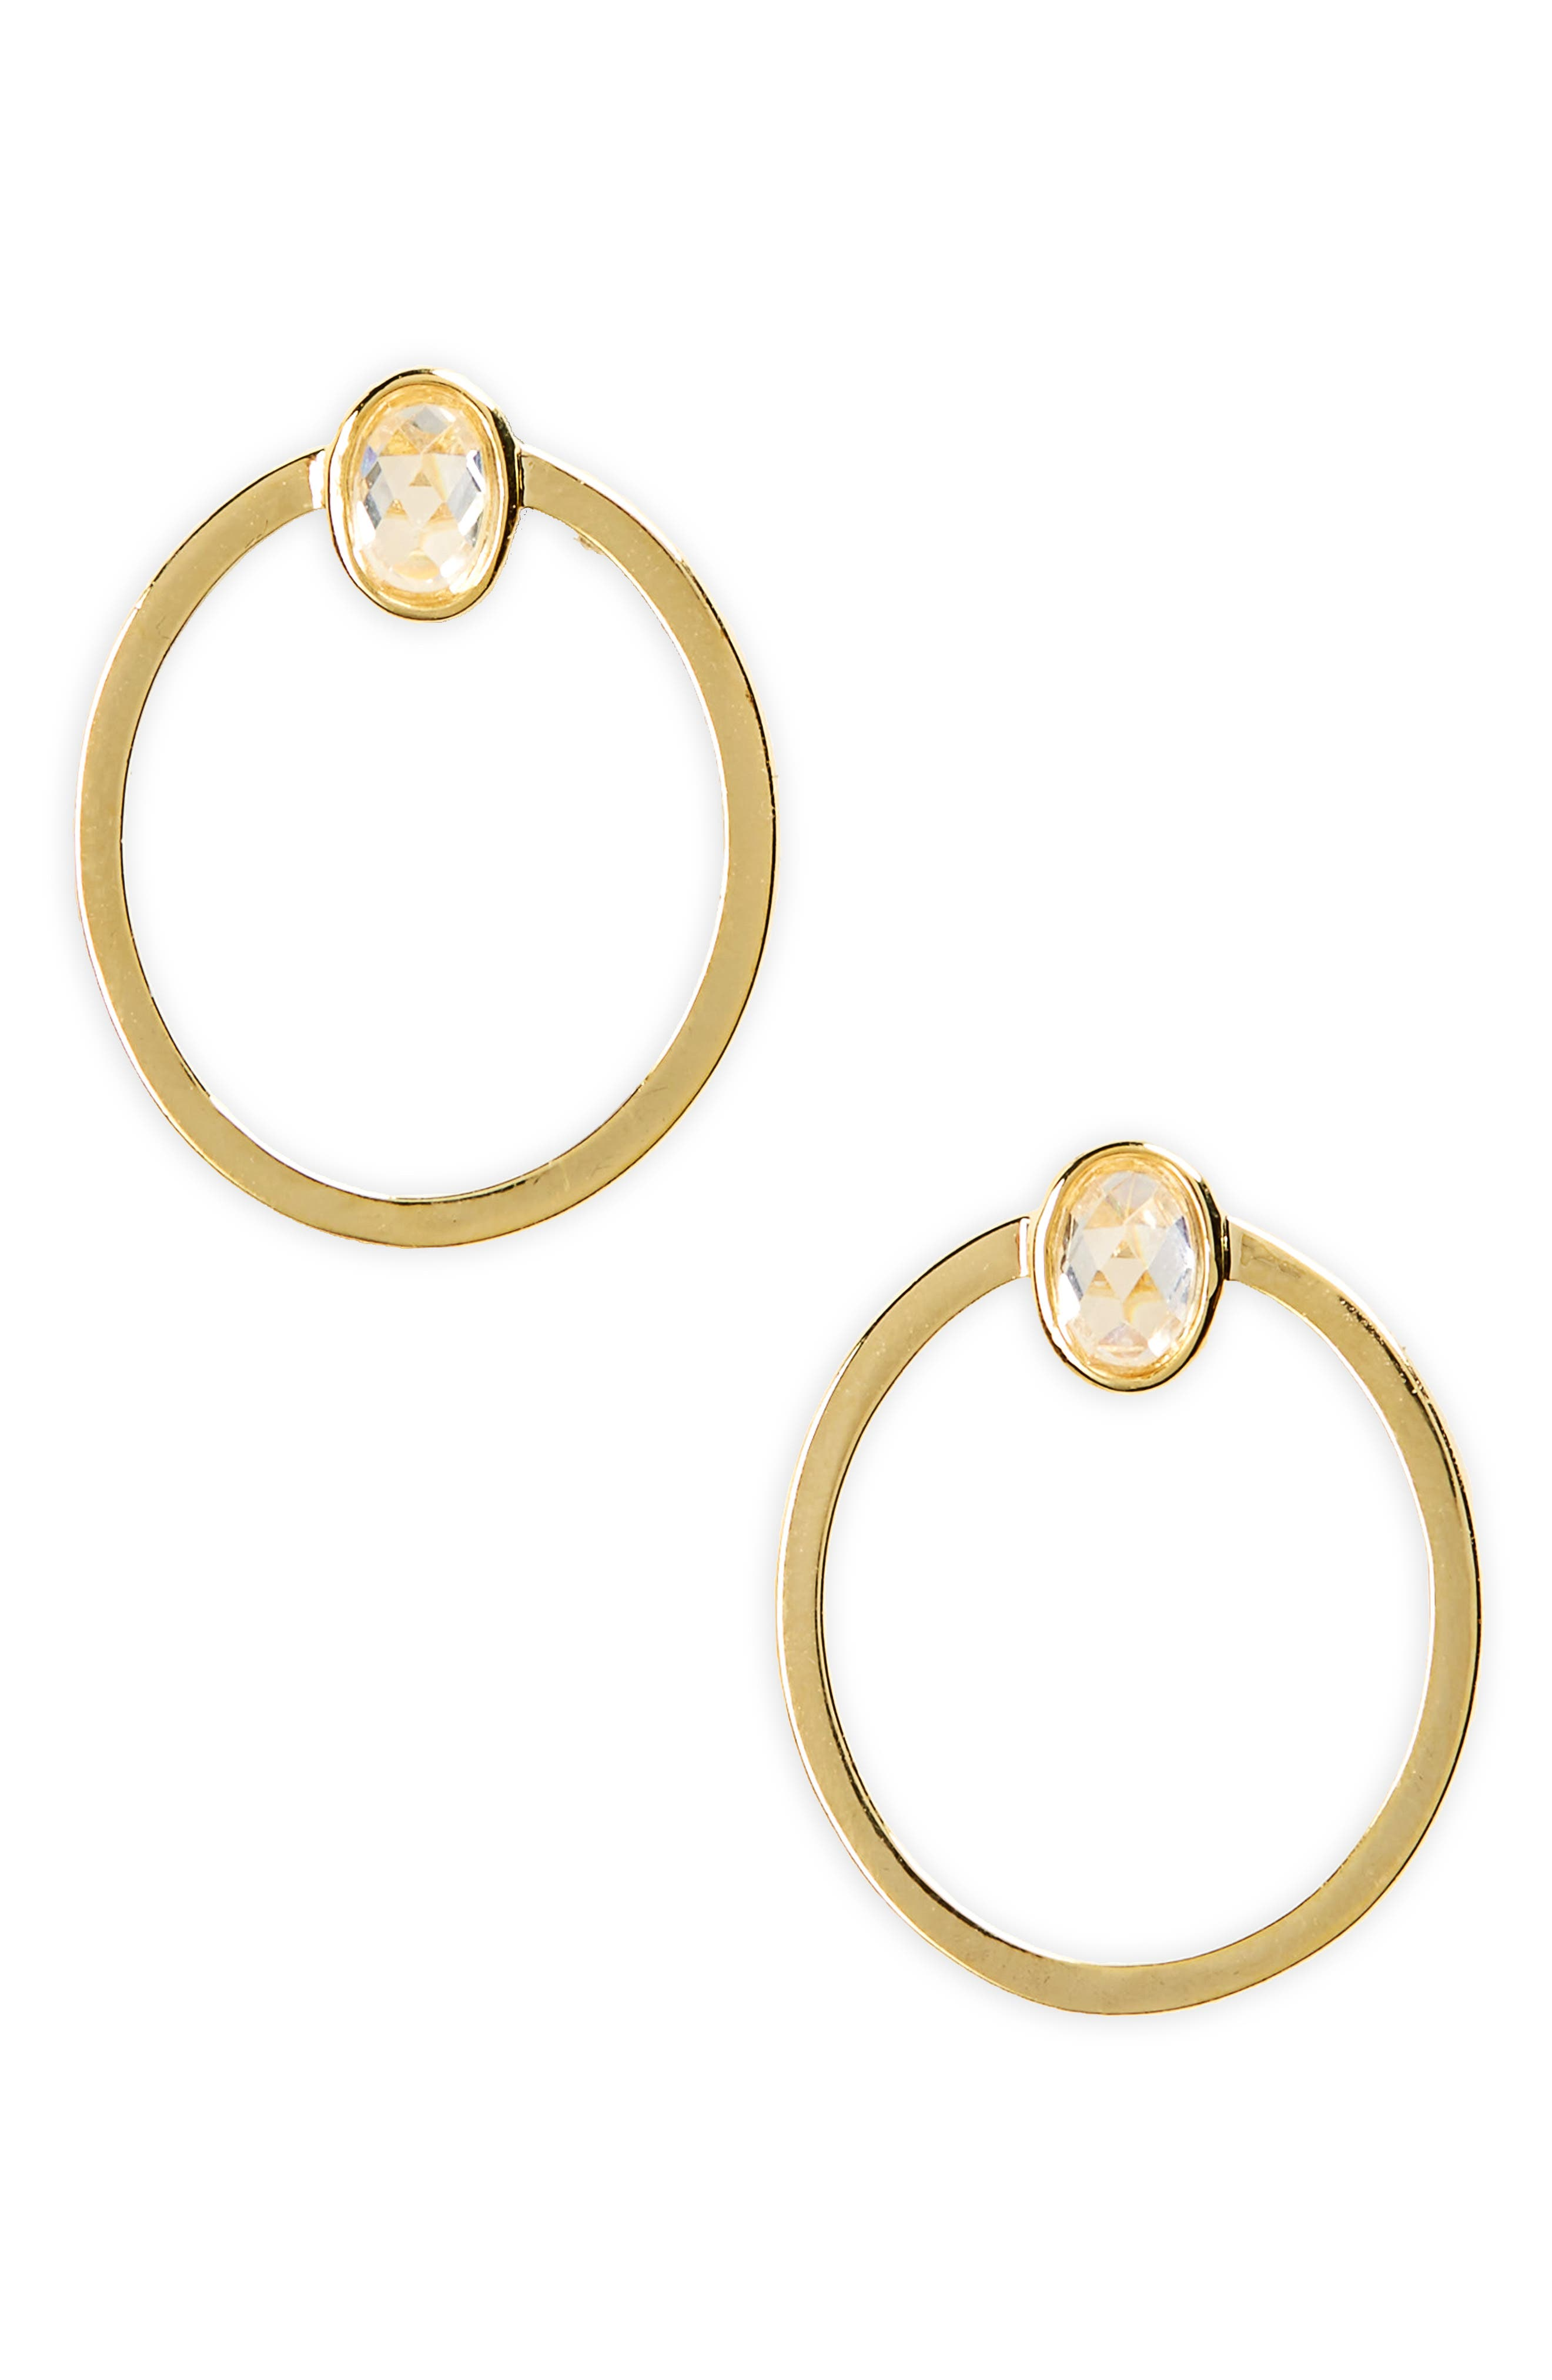 Rebecca Hoop Earrings,                         Main,                         color, Gold